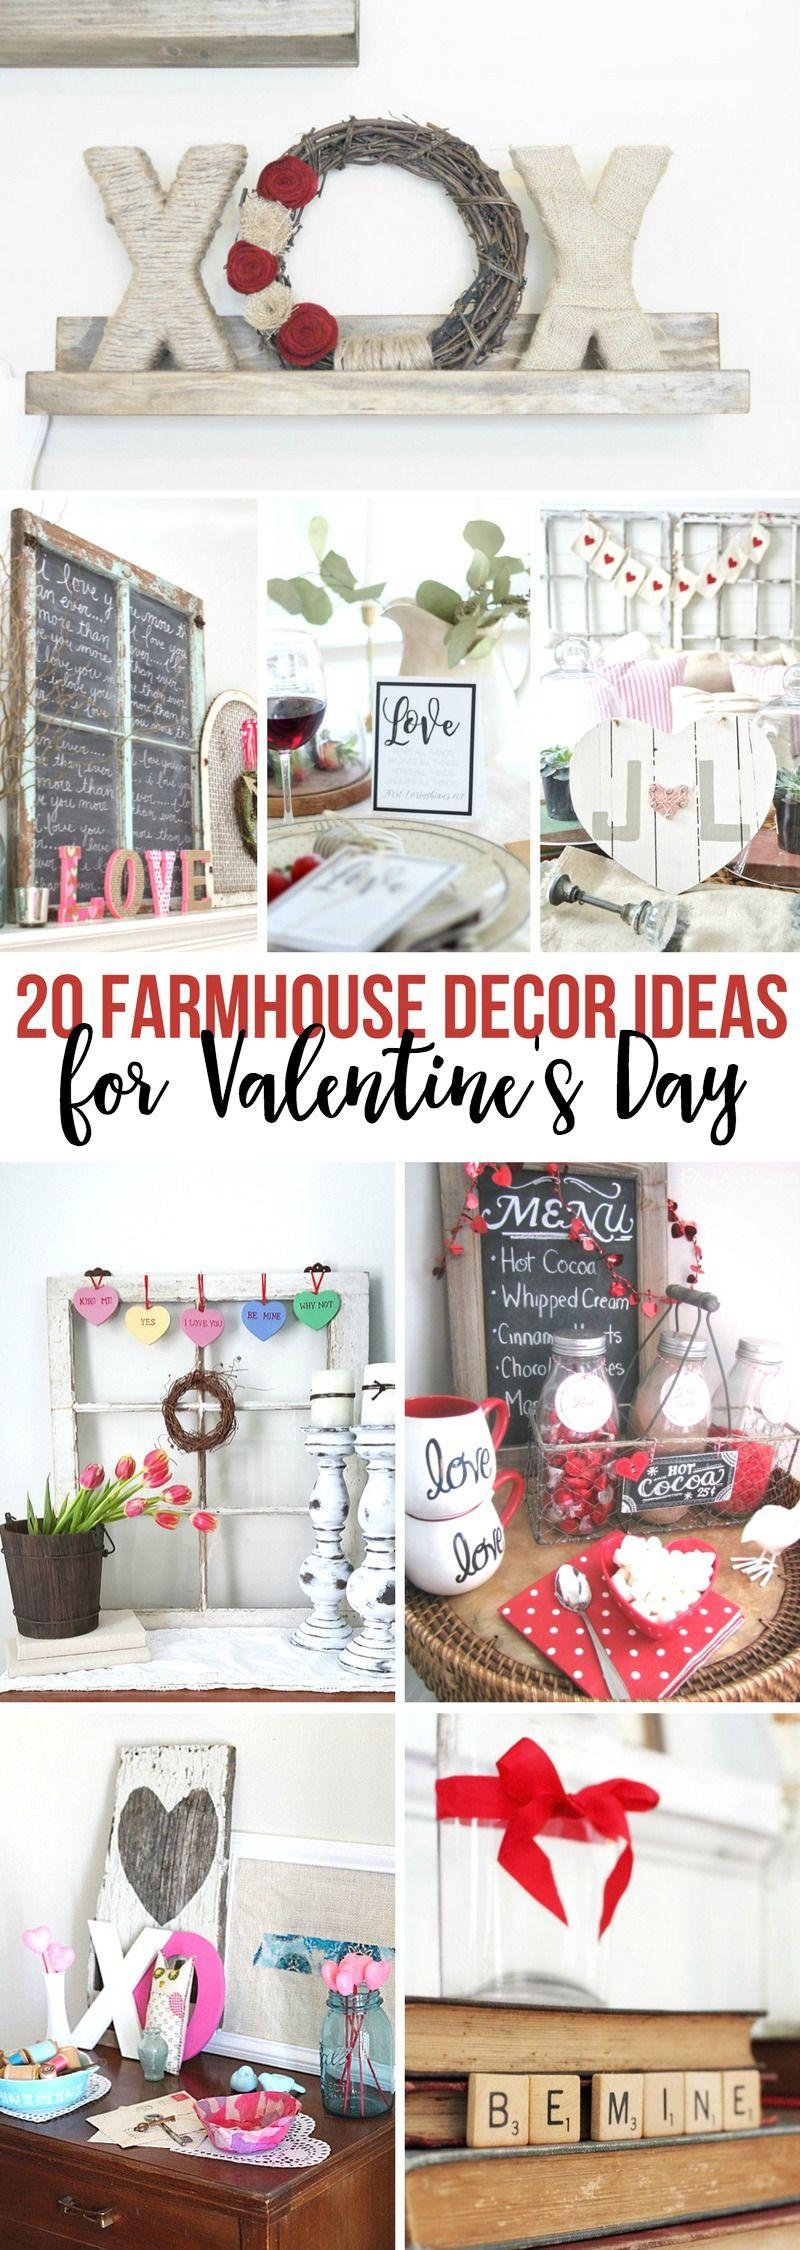 14 Modern Farmhouse Ideas For Valentine